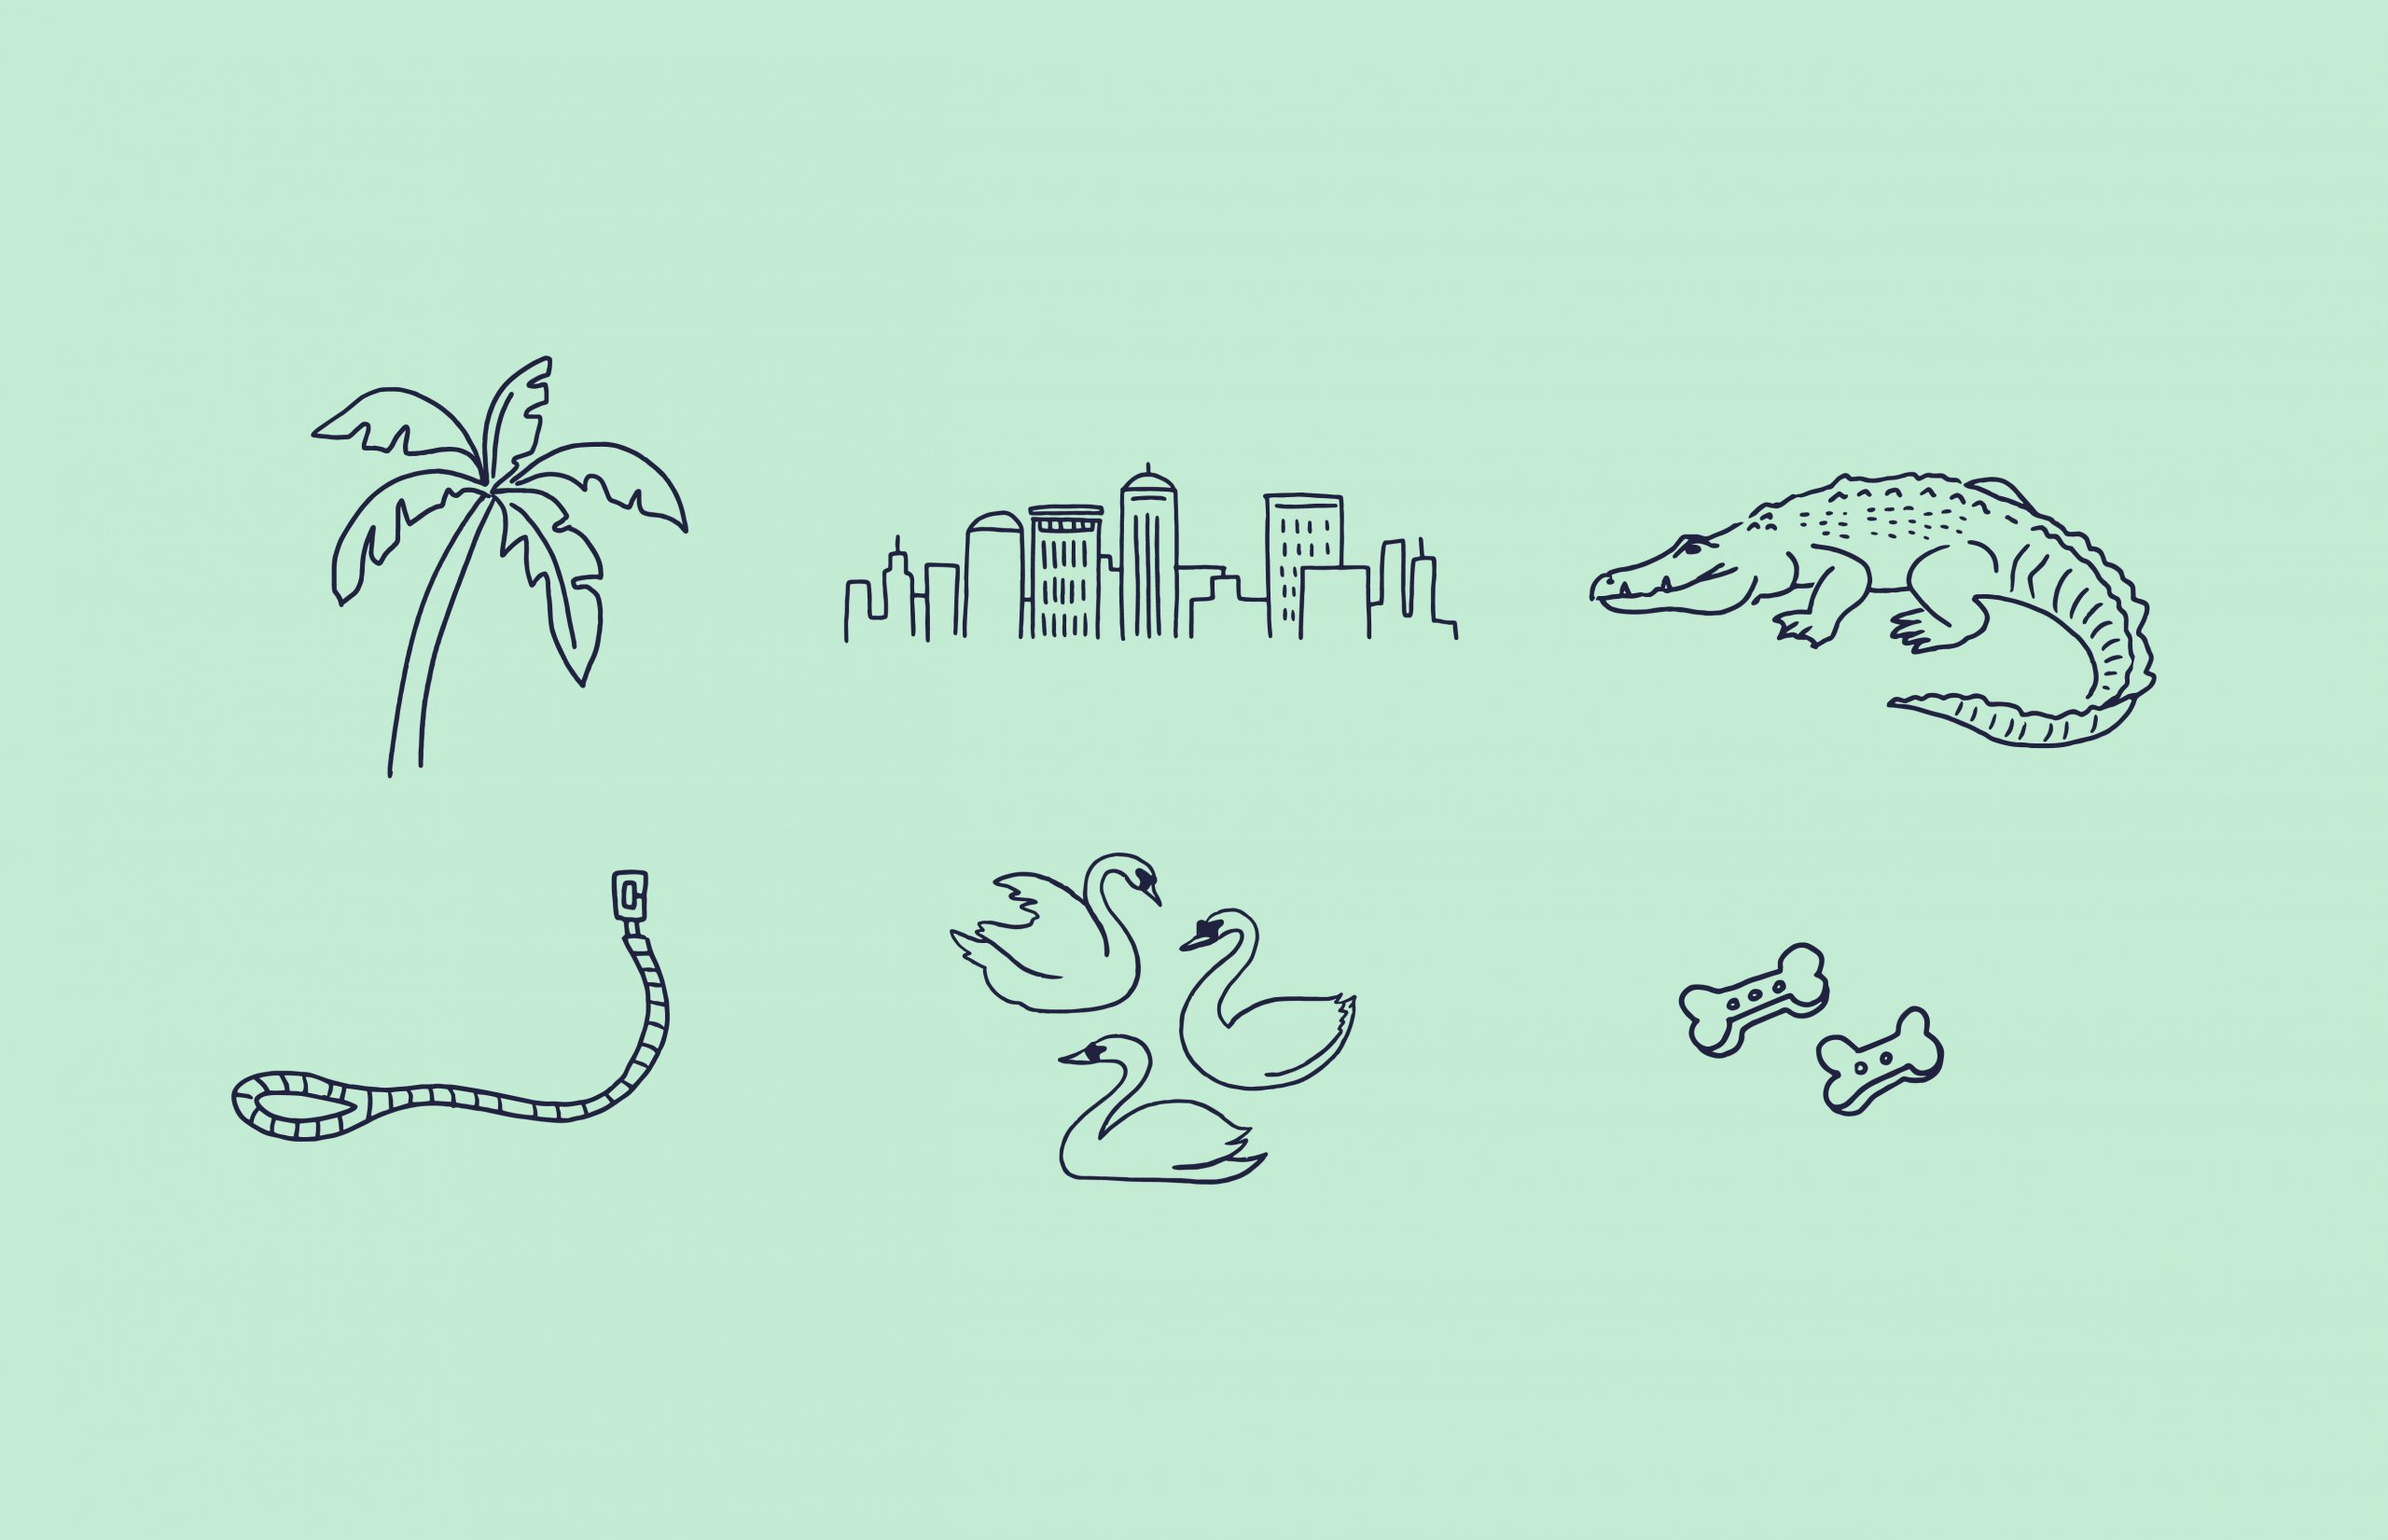 Palm icon, skyline icon, crocodile icon, leash icon, swan icon, bone icon